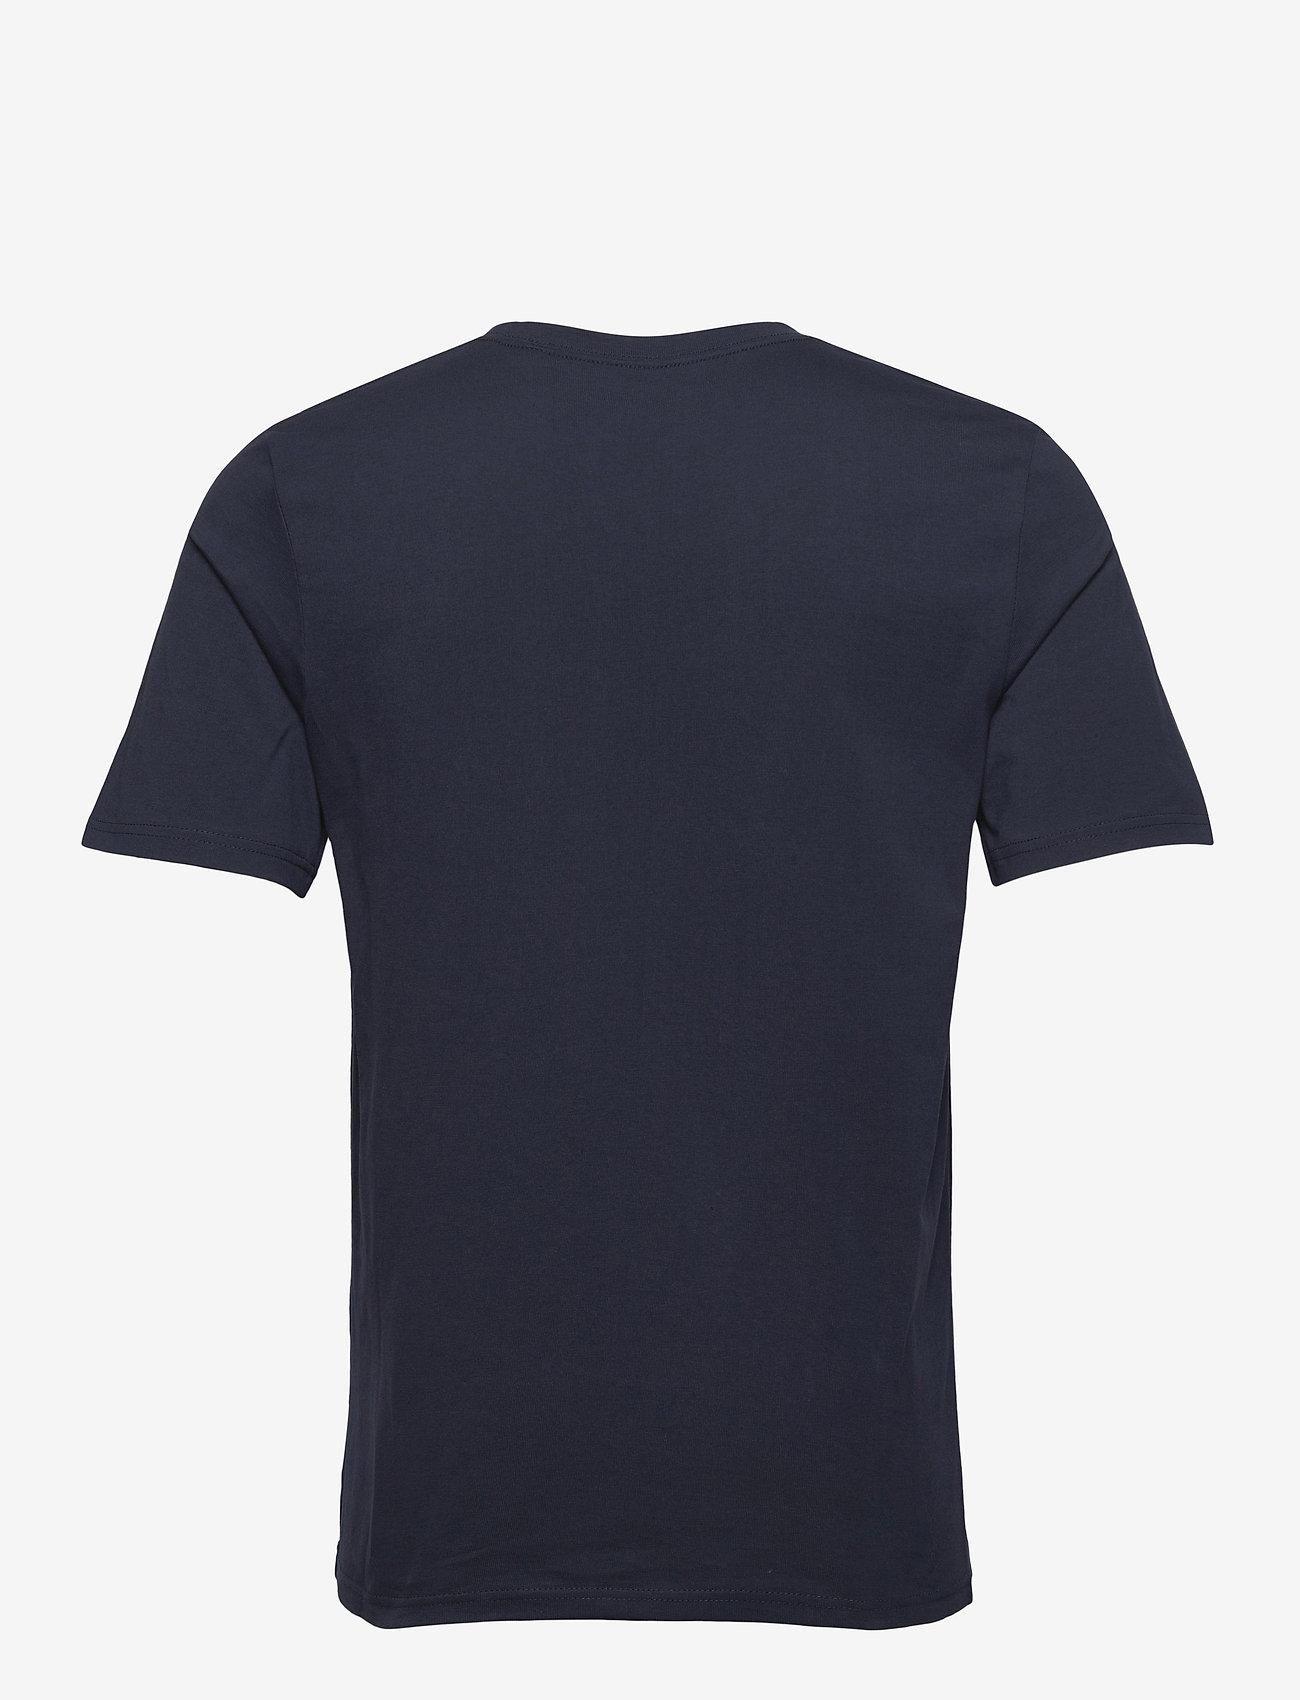 Jack & Jones - JPRBLAWAYN TEE SS CREW NECK - basic t-shirts - navy blazer - 1